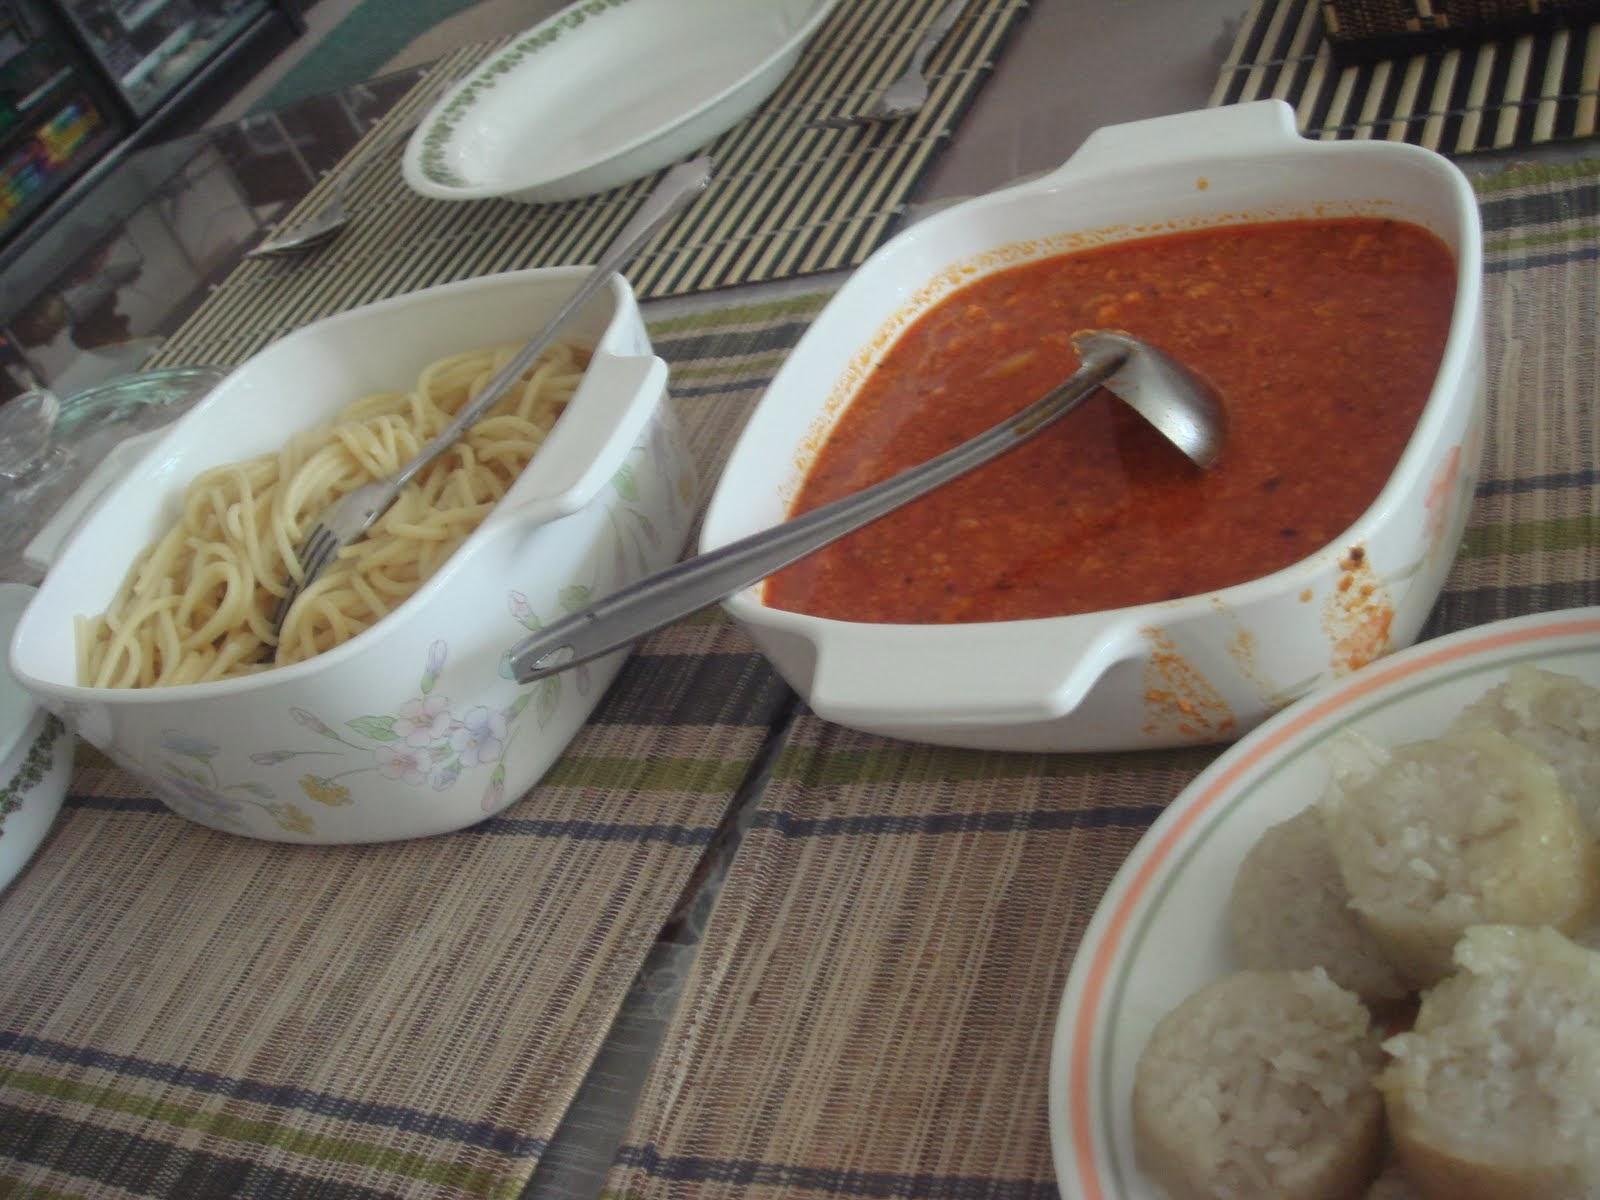 Resepi Orang Bujang Western Food Spaghetti Bolognese Selera Melayu